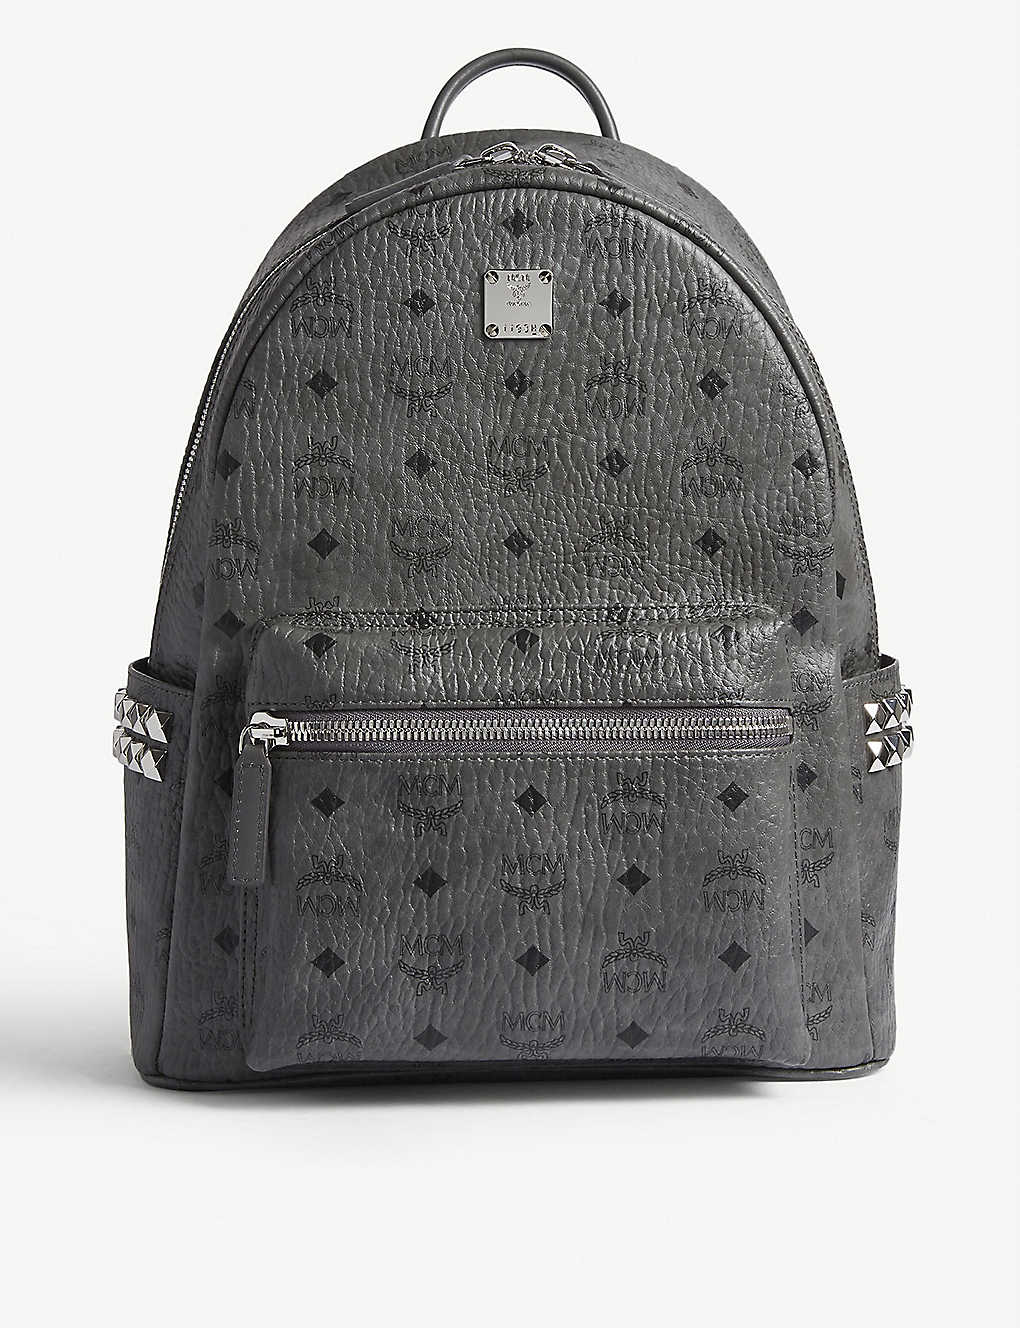 ae5e27dc0105 MCM - Stark side studs leather backpack | Selfridges.com